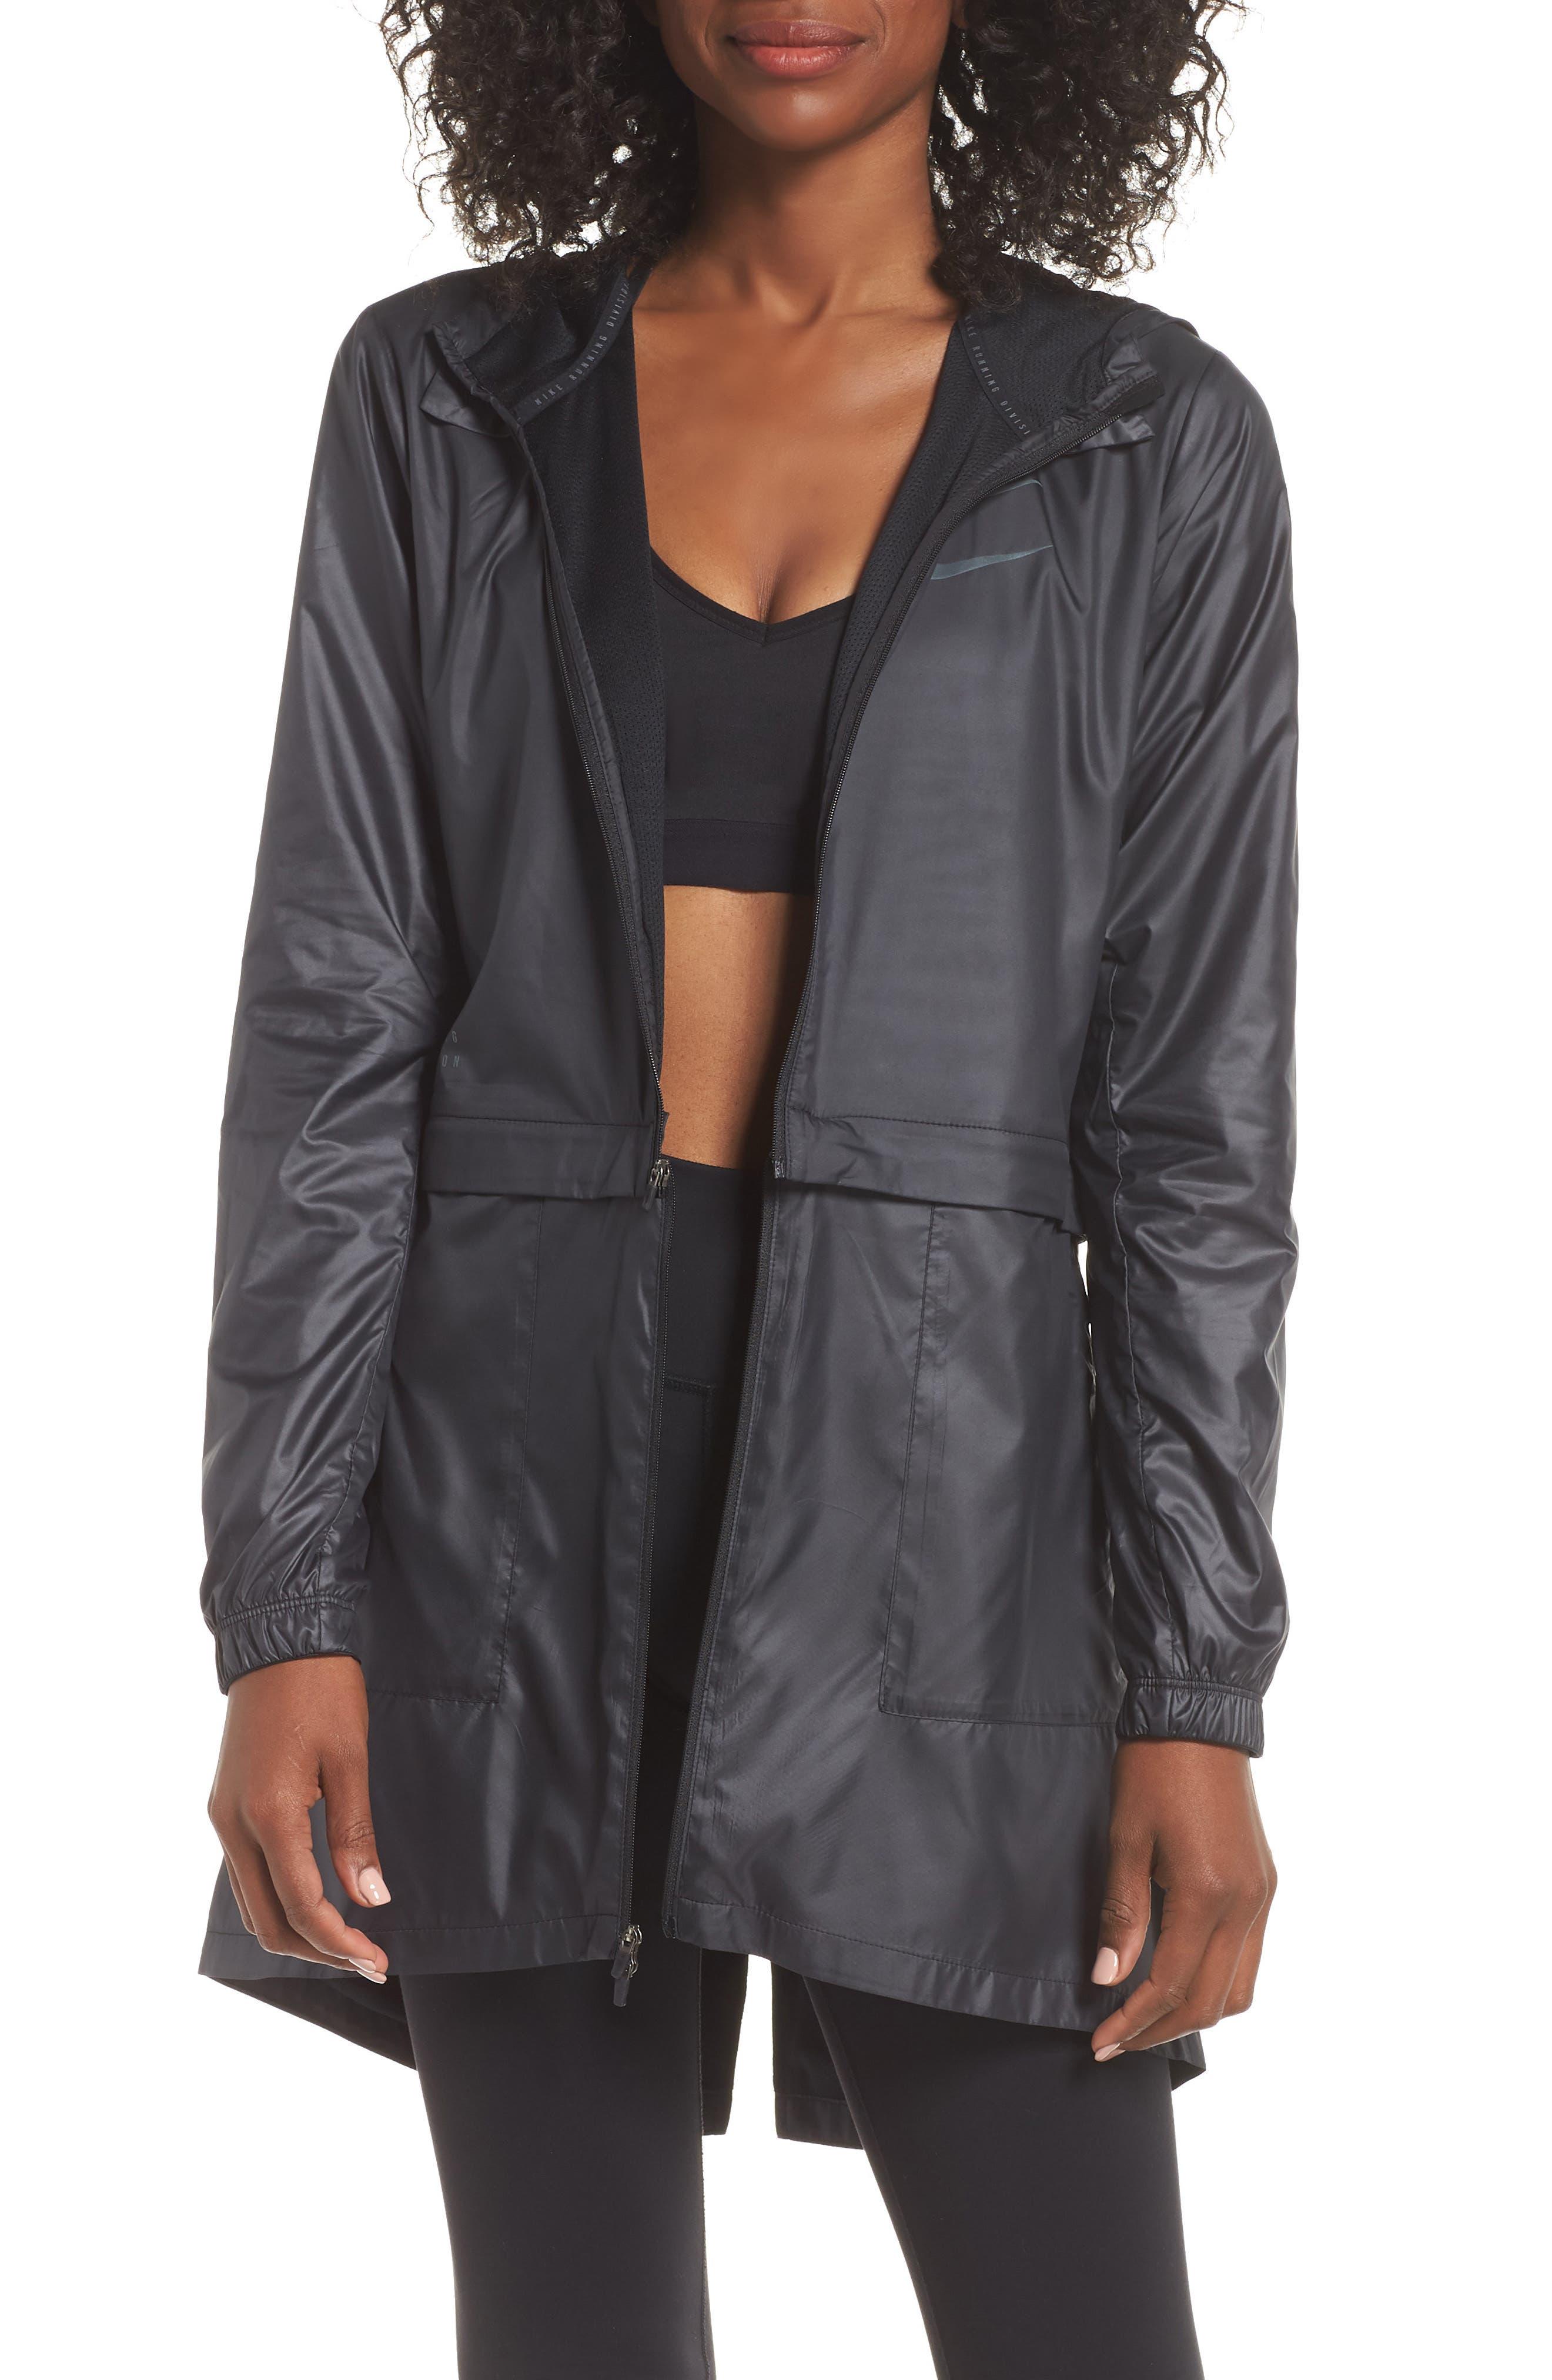 Women's Convertible Hooded Running Jacket,                             Main thumbnail 1, color,                             010